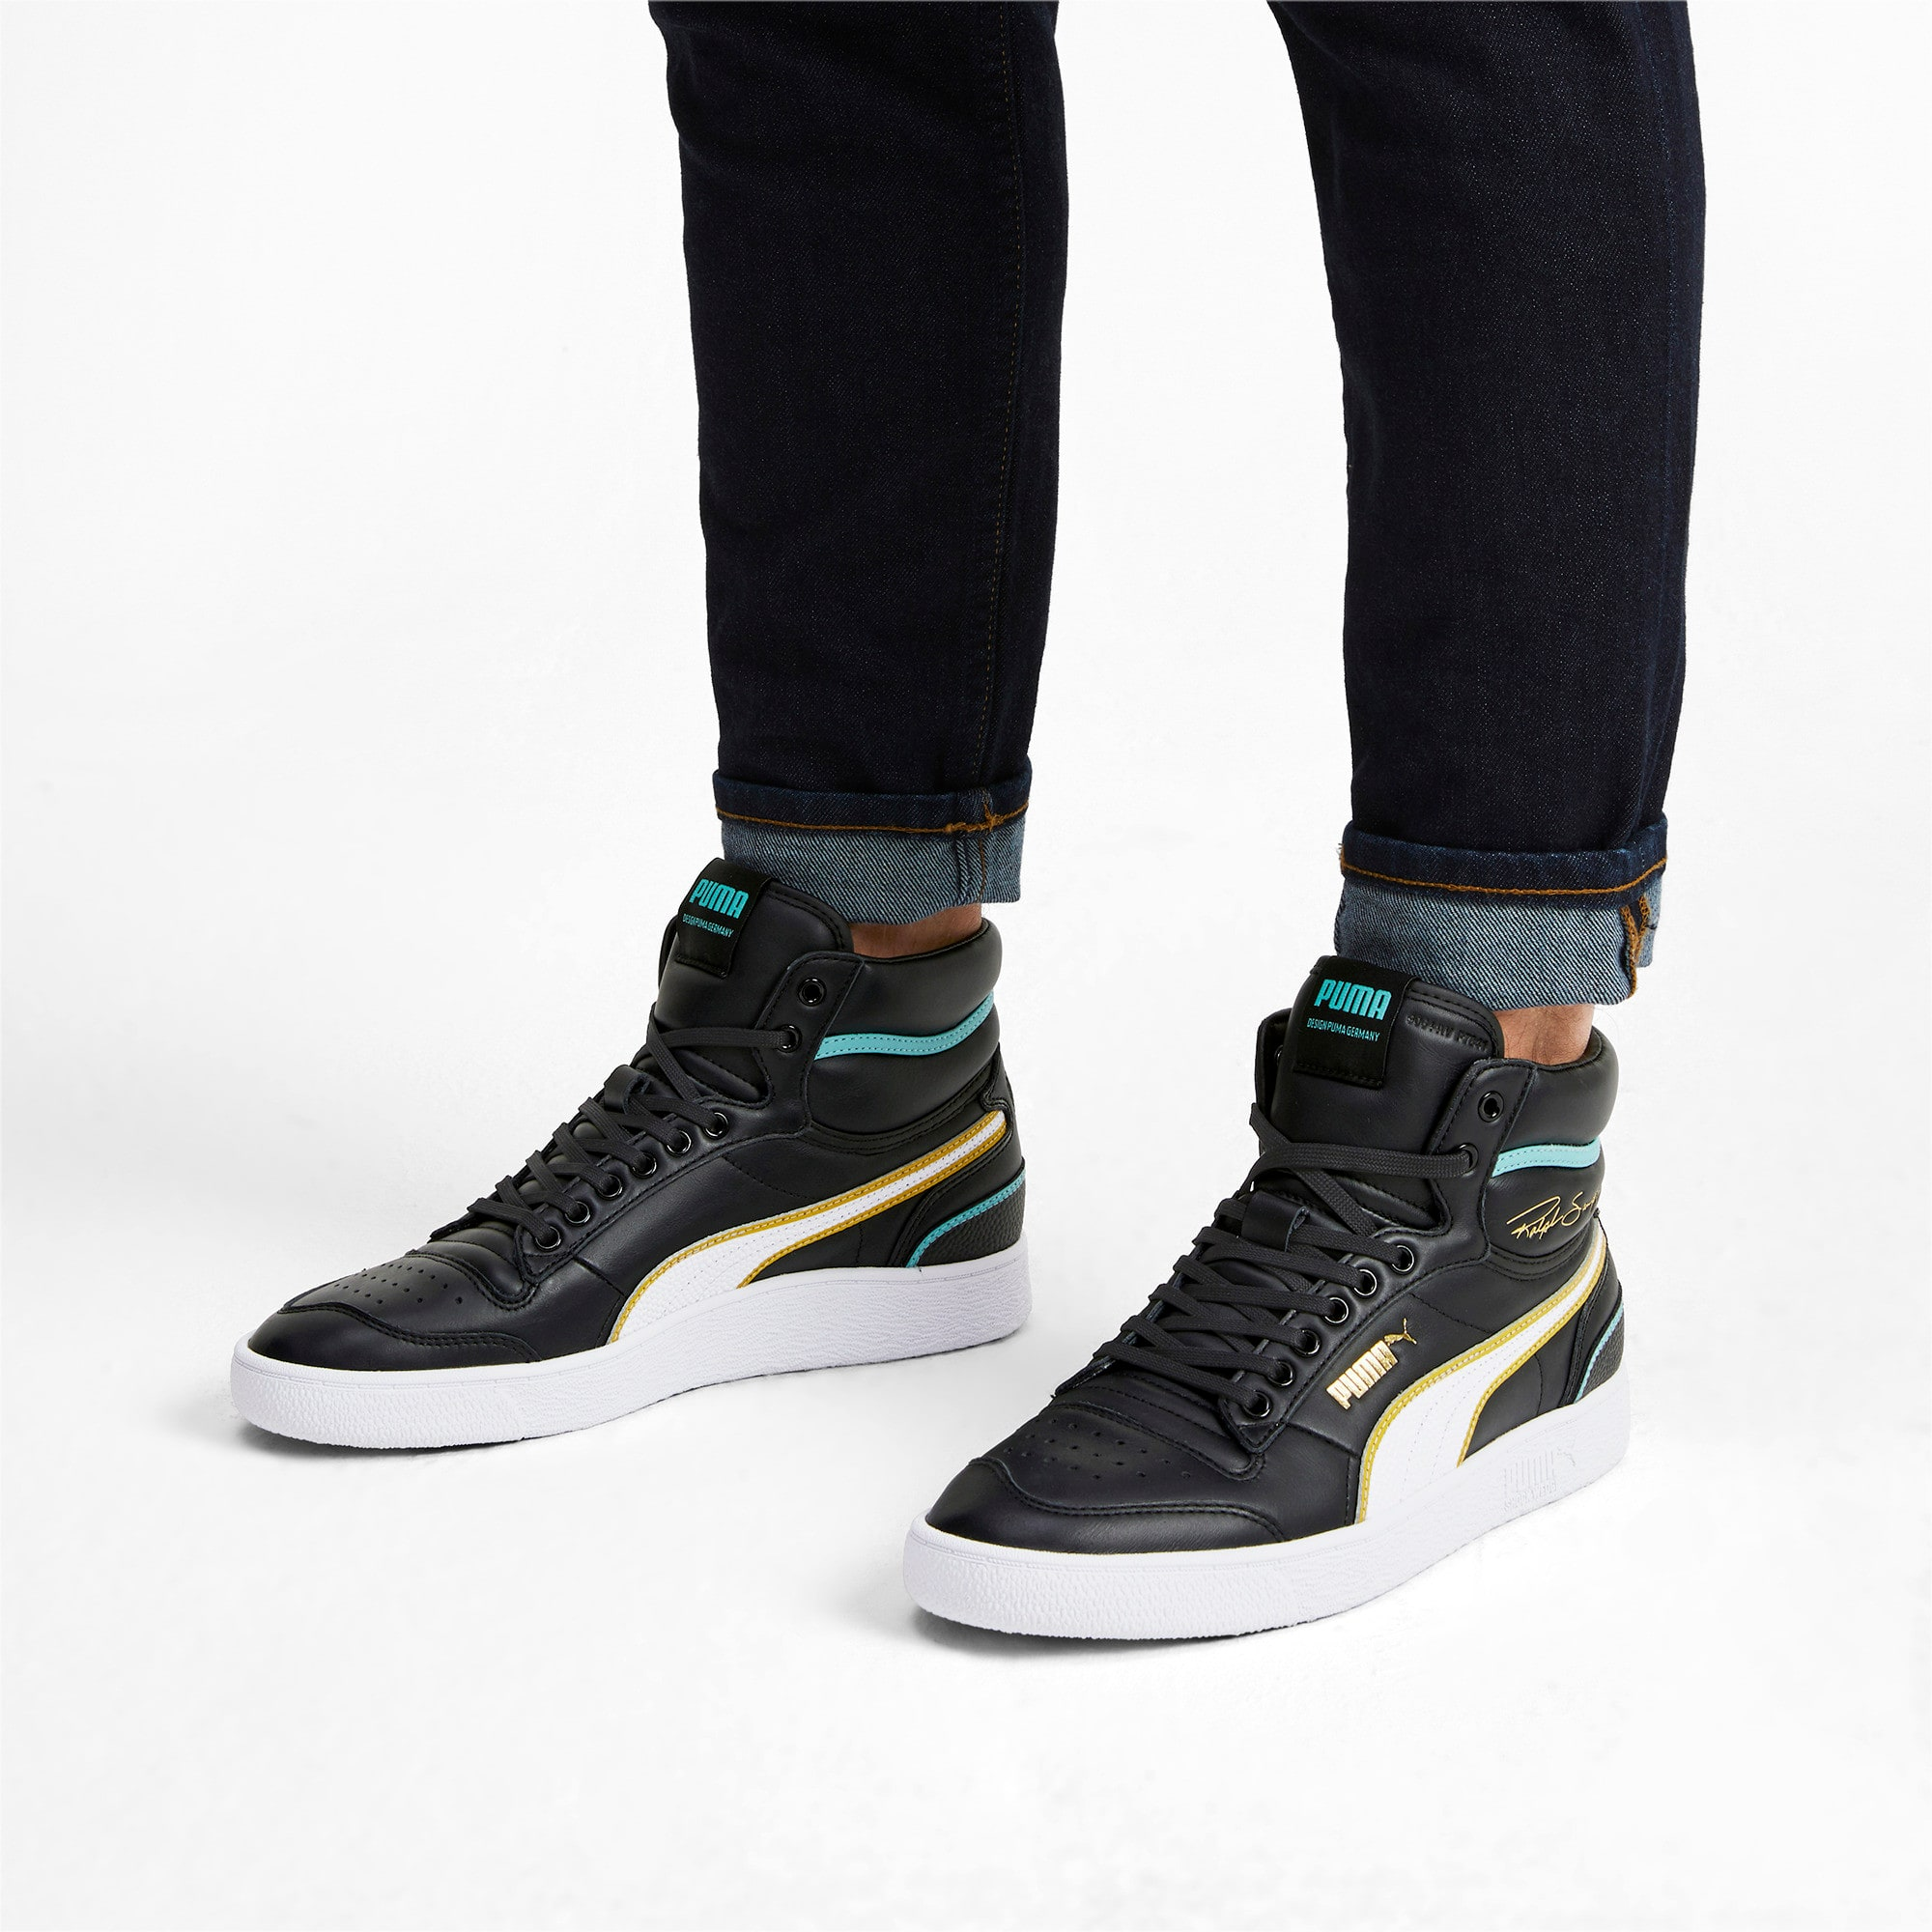 Miniatura 2 de Zapatos deportivos de caña media Ralph Sampson Hoops, Puma Blk-Puma Wht-Puma Wht, mediano